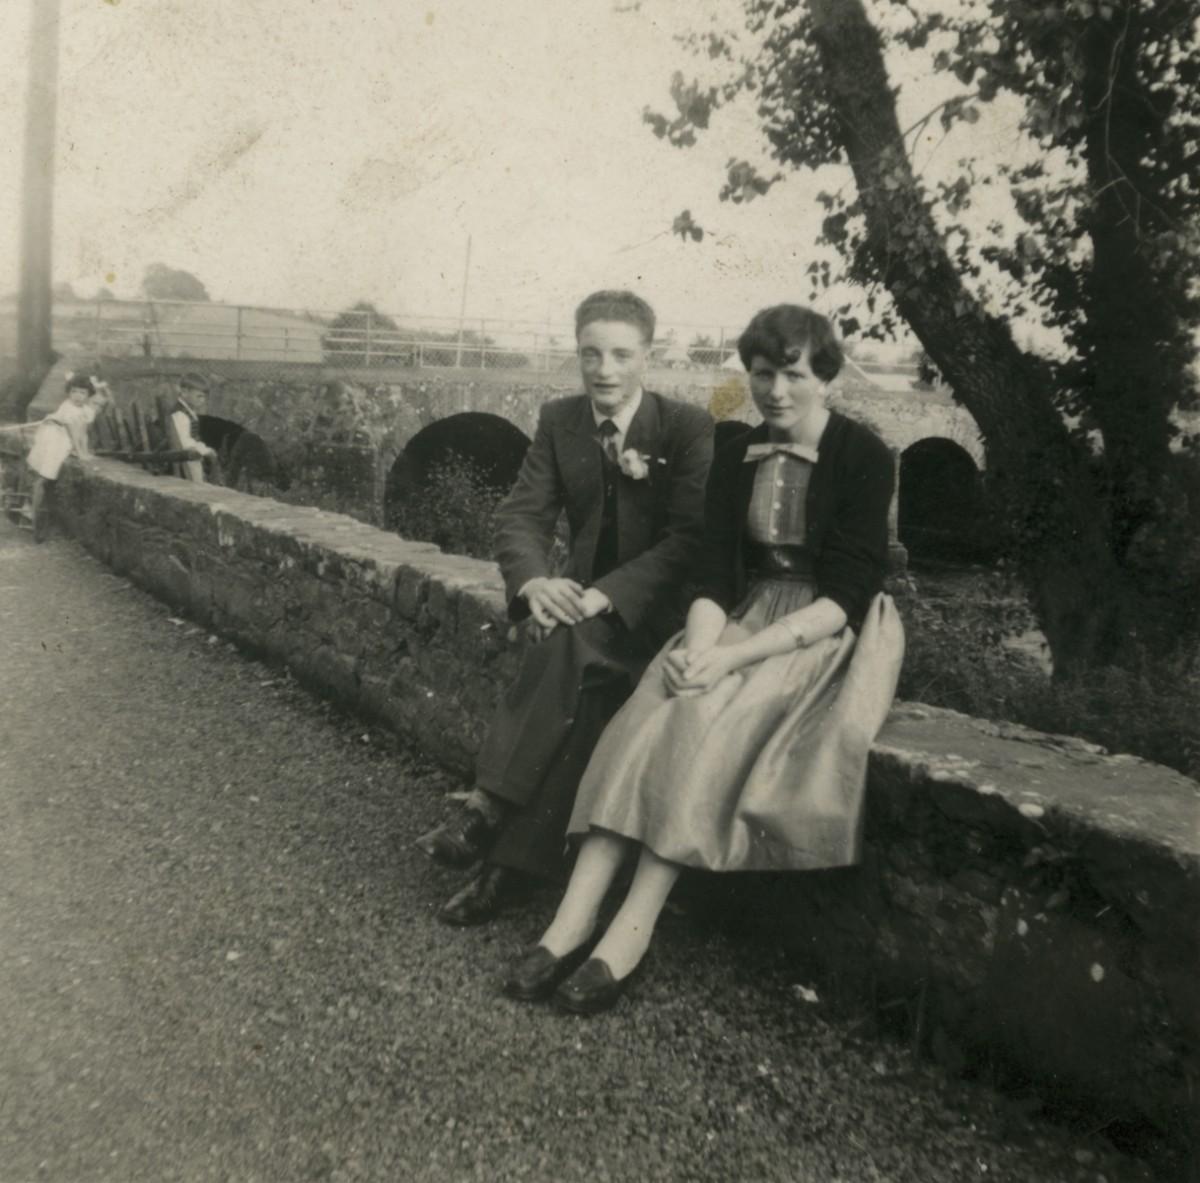 Clerkin // County Monaghan :: Fields and Sherlock at Emyvale Bridge, Monaghan